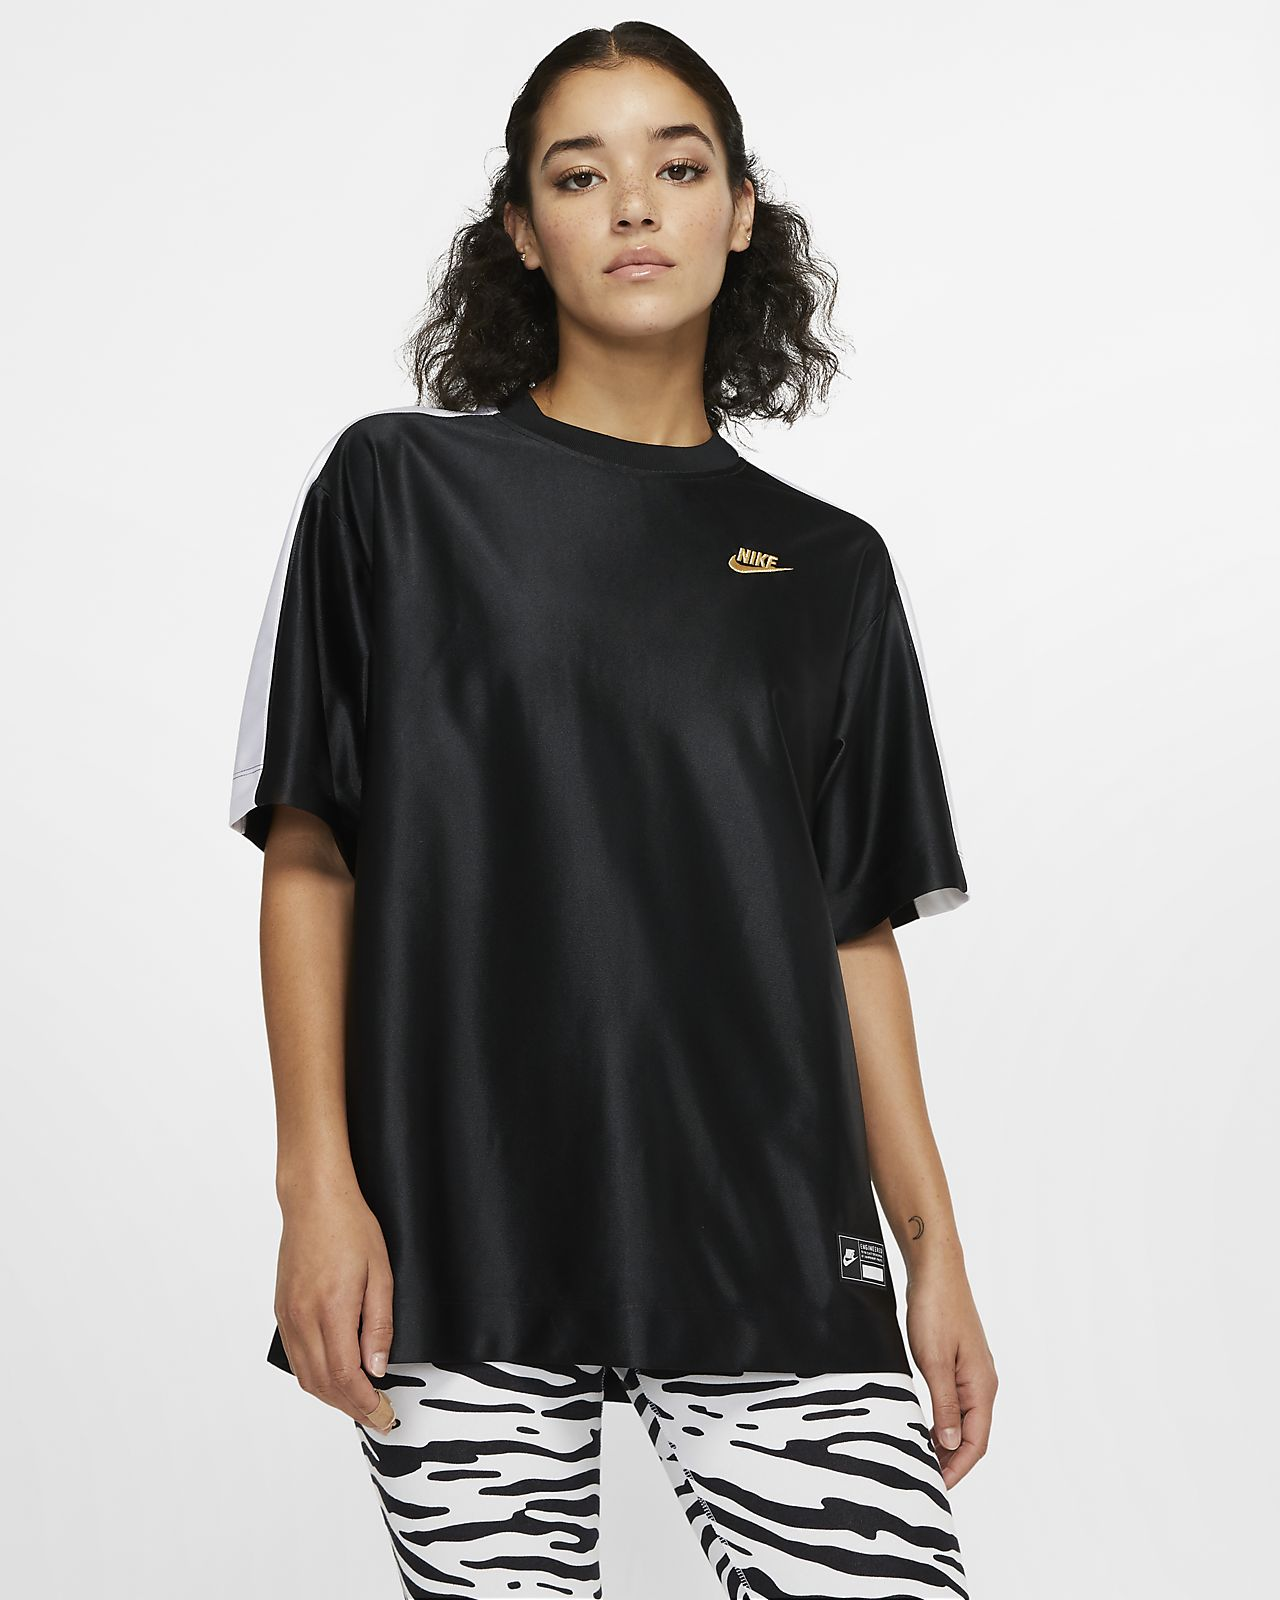 Женская футболка с коротким рукавом Nike Sportswear Icon Clash